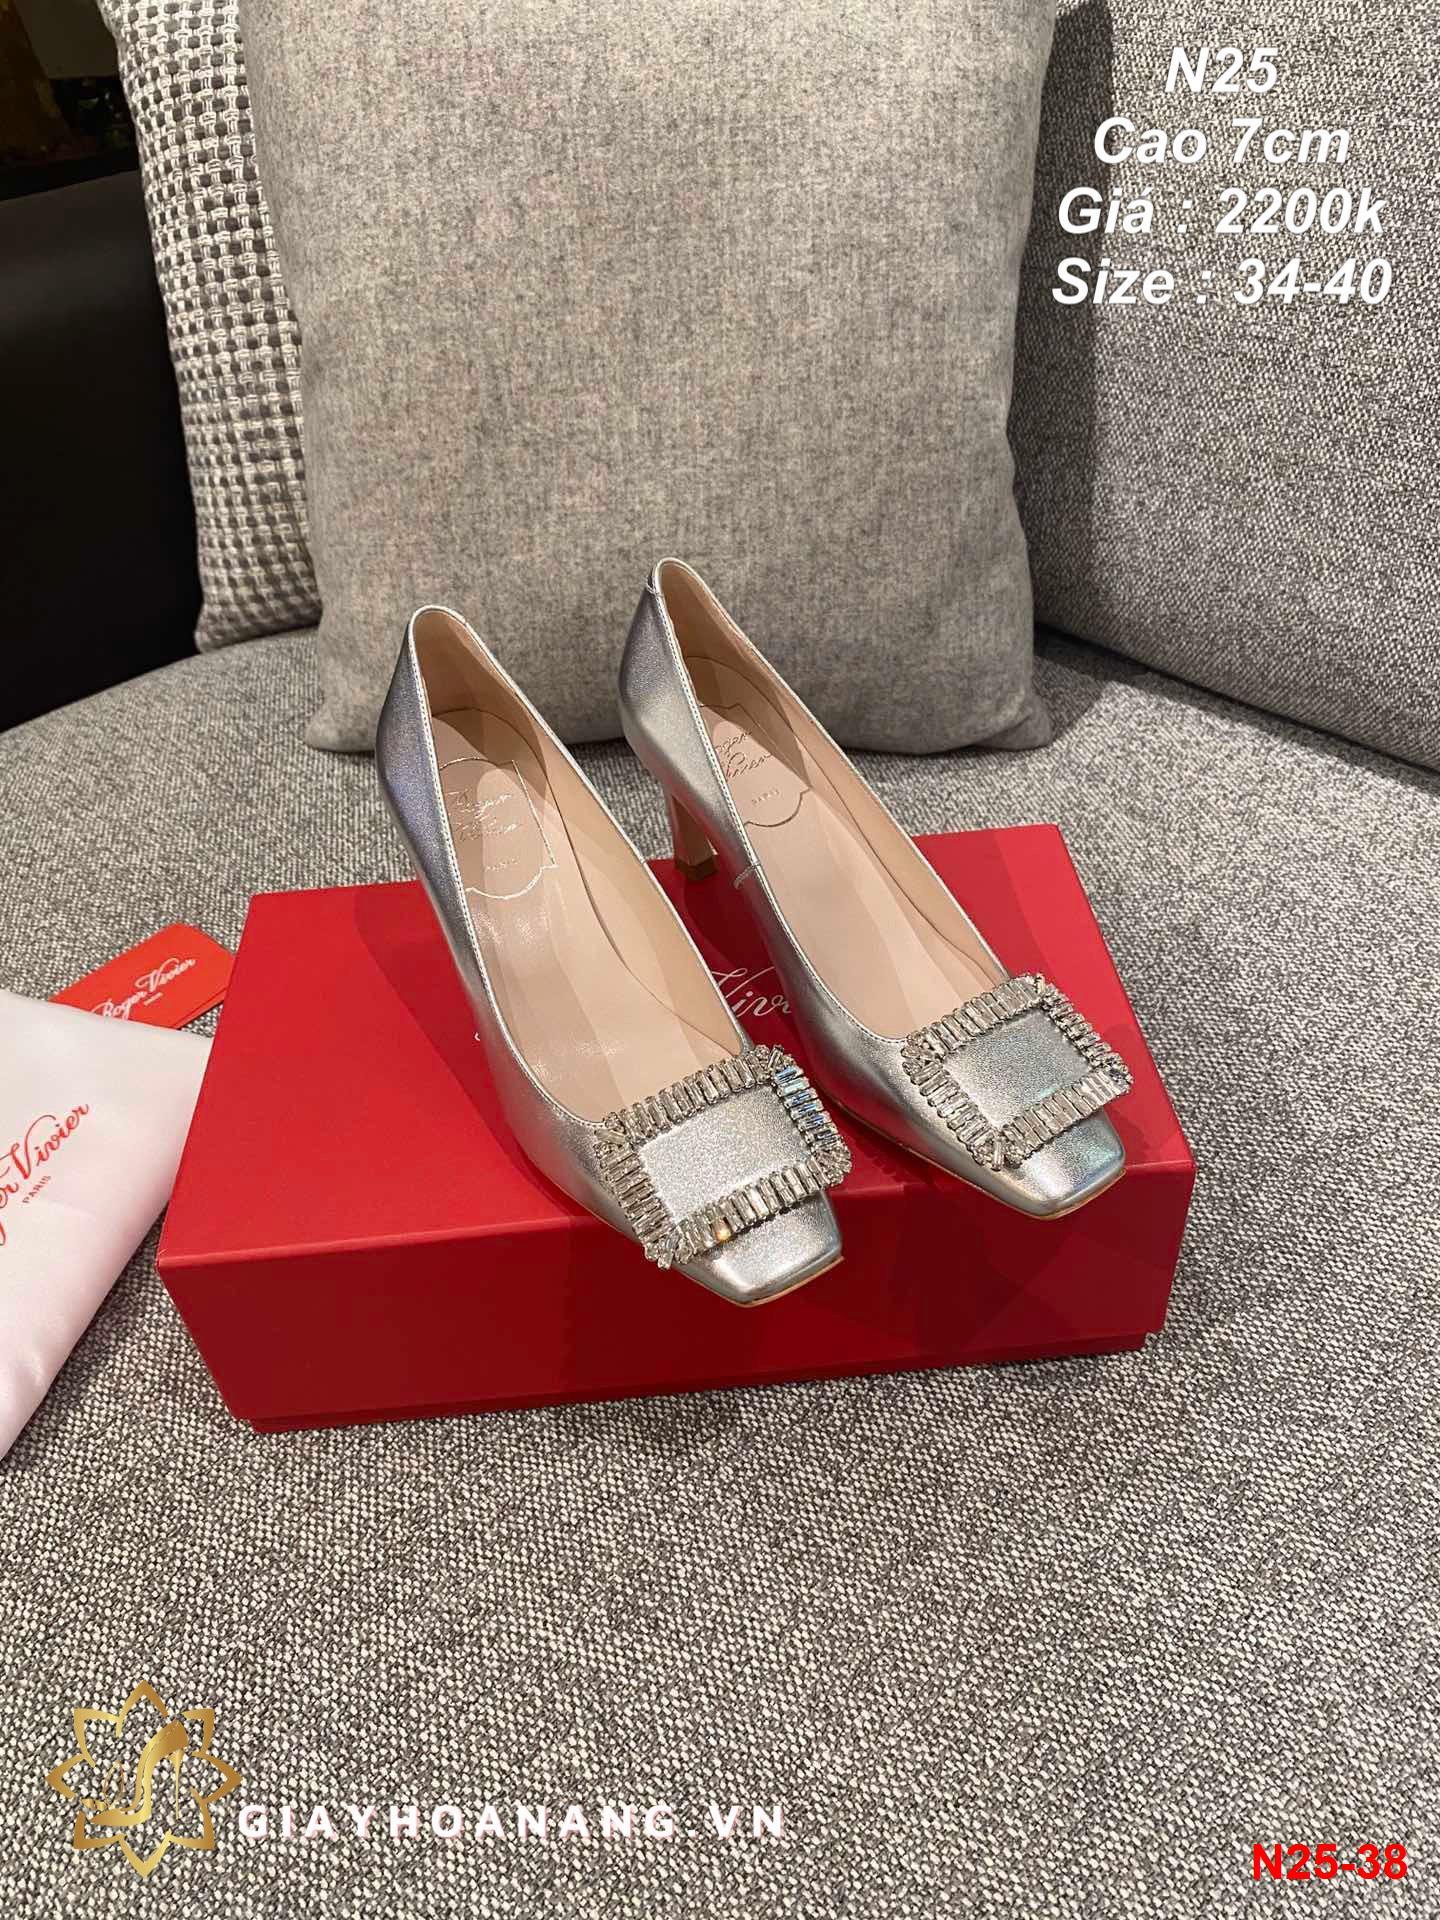 N25-38 Roger Vivier giày cao 7cm siêu cấp